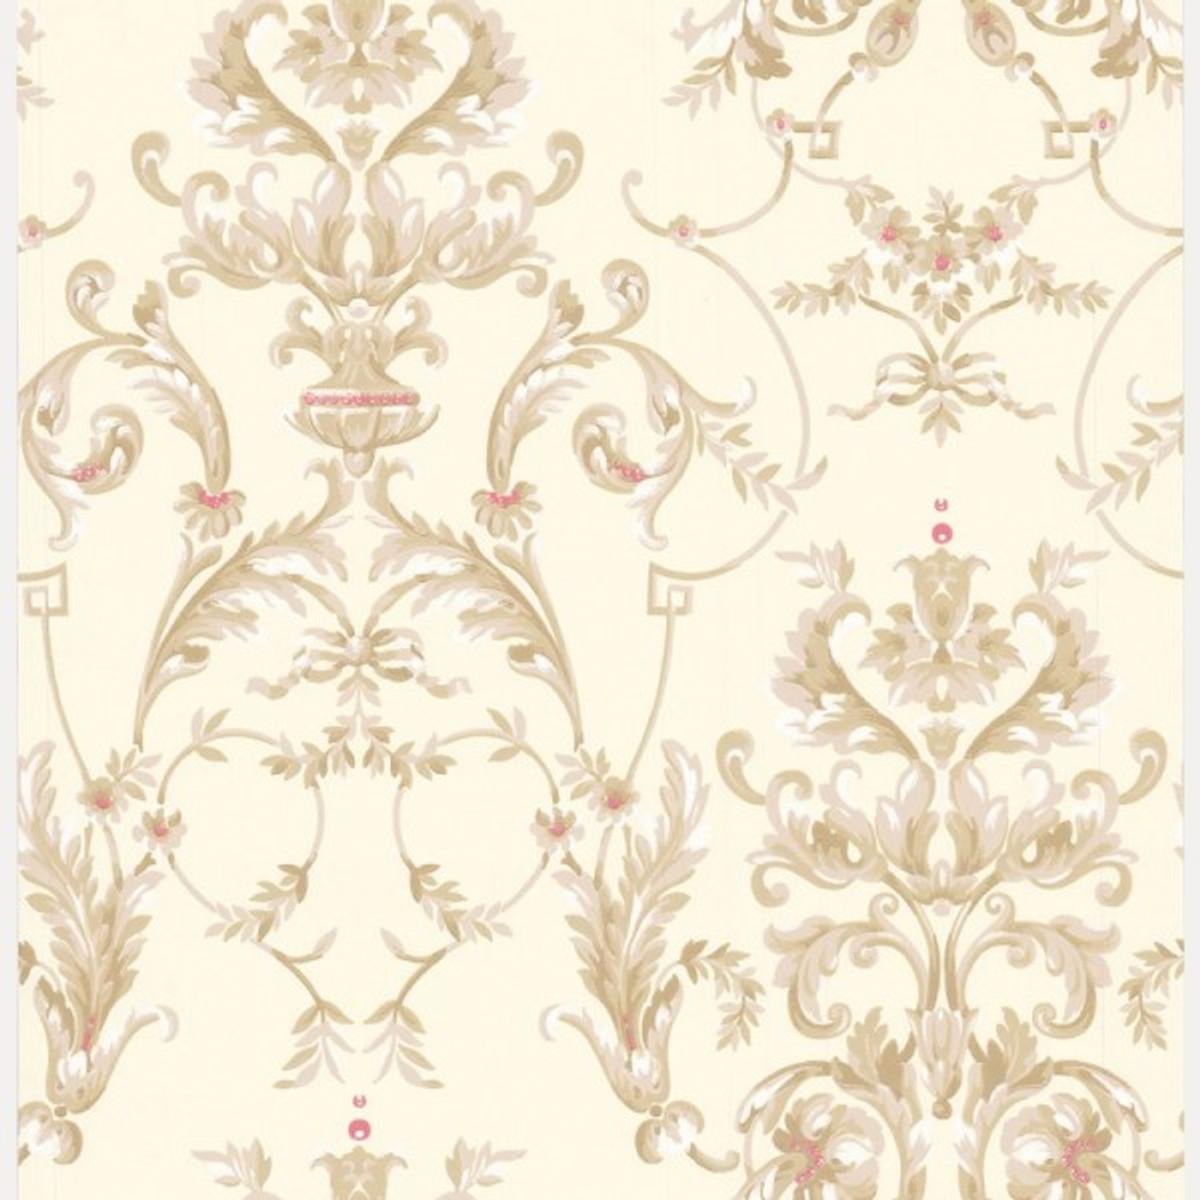 graham brown barock tapete bewitched vliestapete vlies mod 50 455 designer tapeten graham. Black Bedroom Furniture Sets. Home Design Ideas